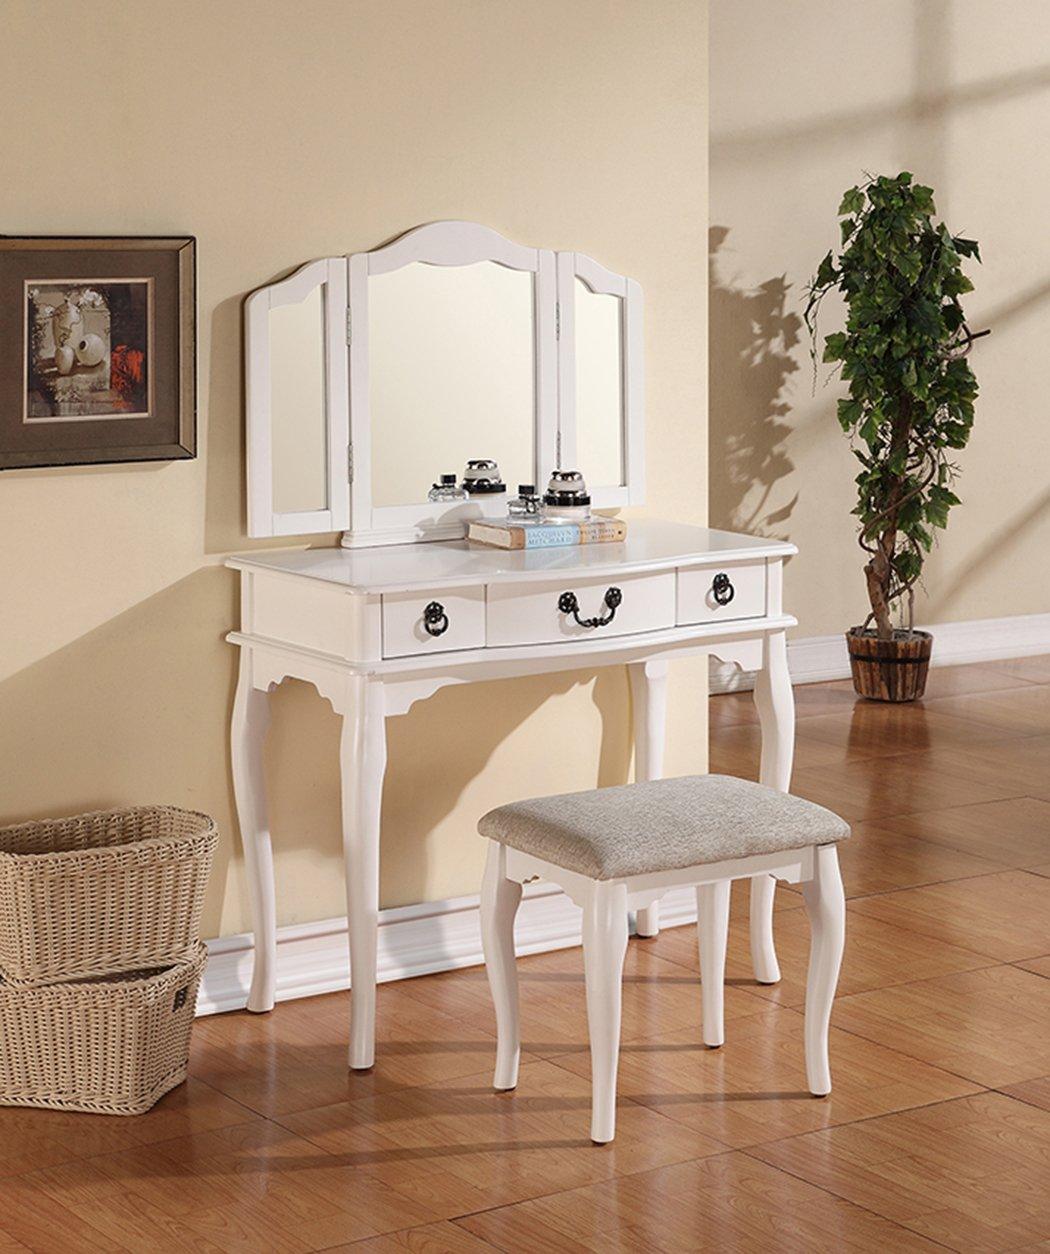 Amazon.com: Poundex Bobkona Susana Tri Fold Mirror Vanity Table With Stool  Set, White: Kitchen U0026 Dining